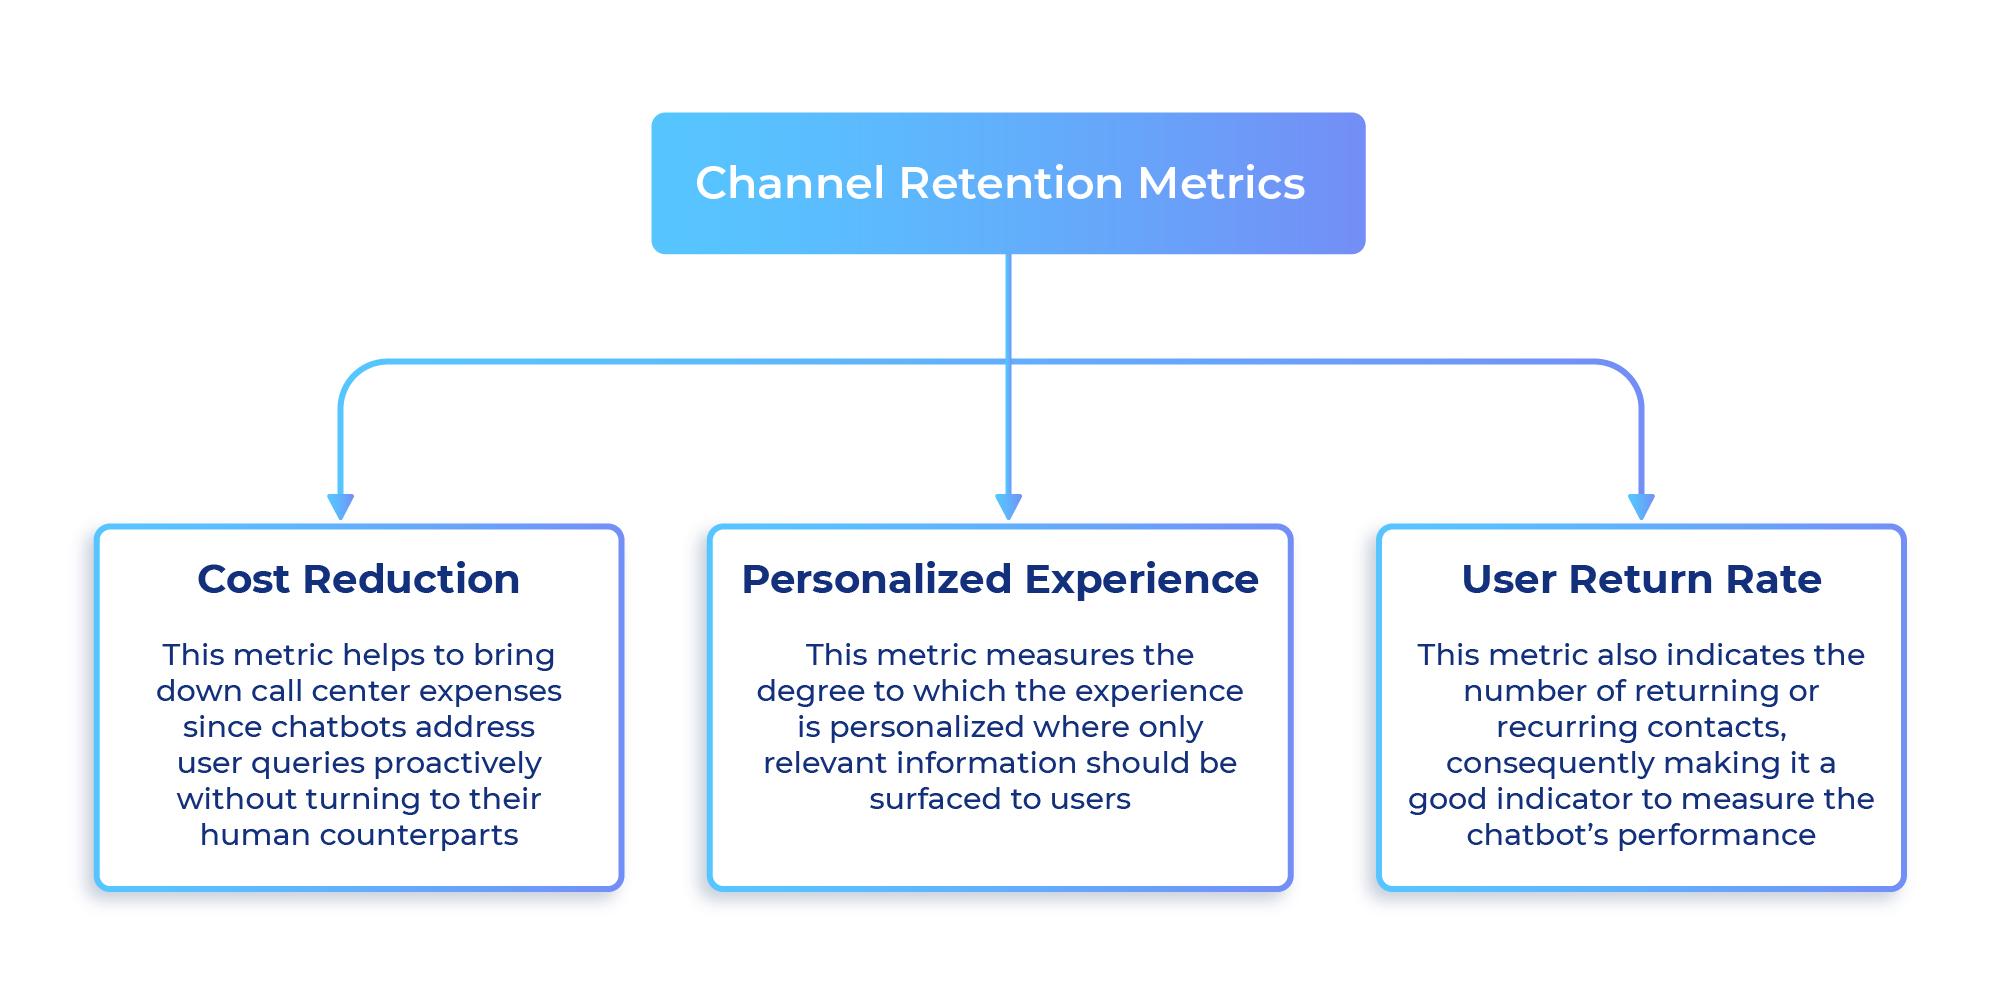 Channel Retention Metrics